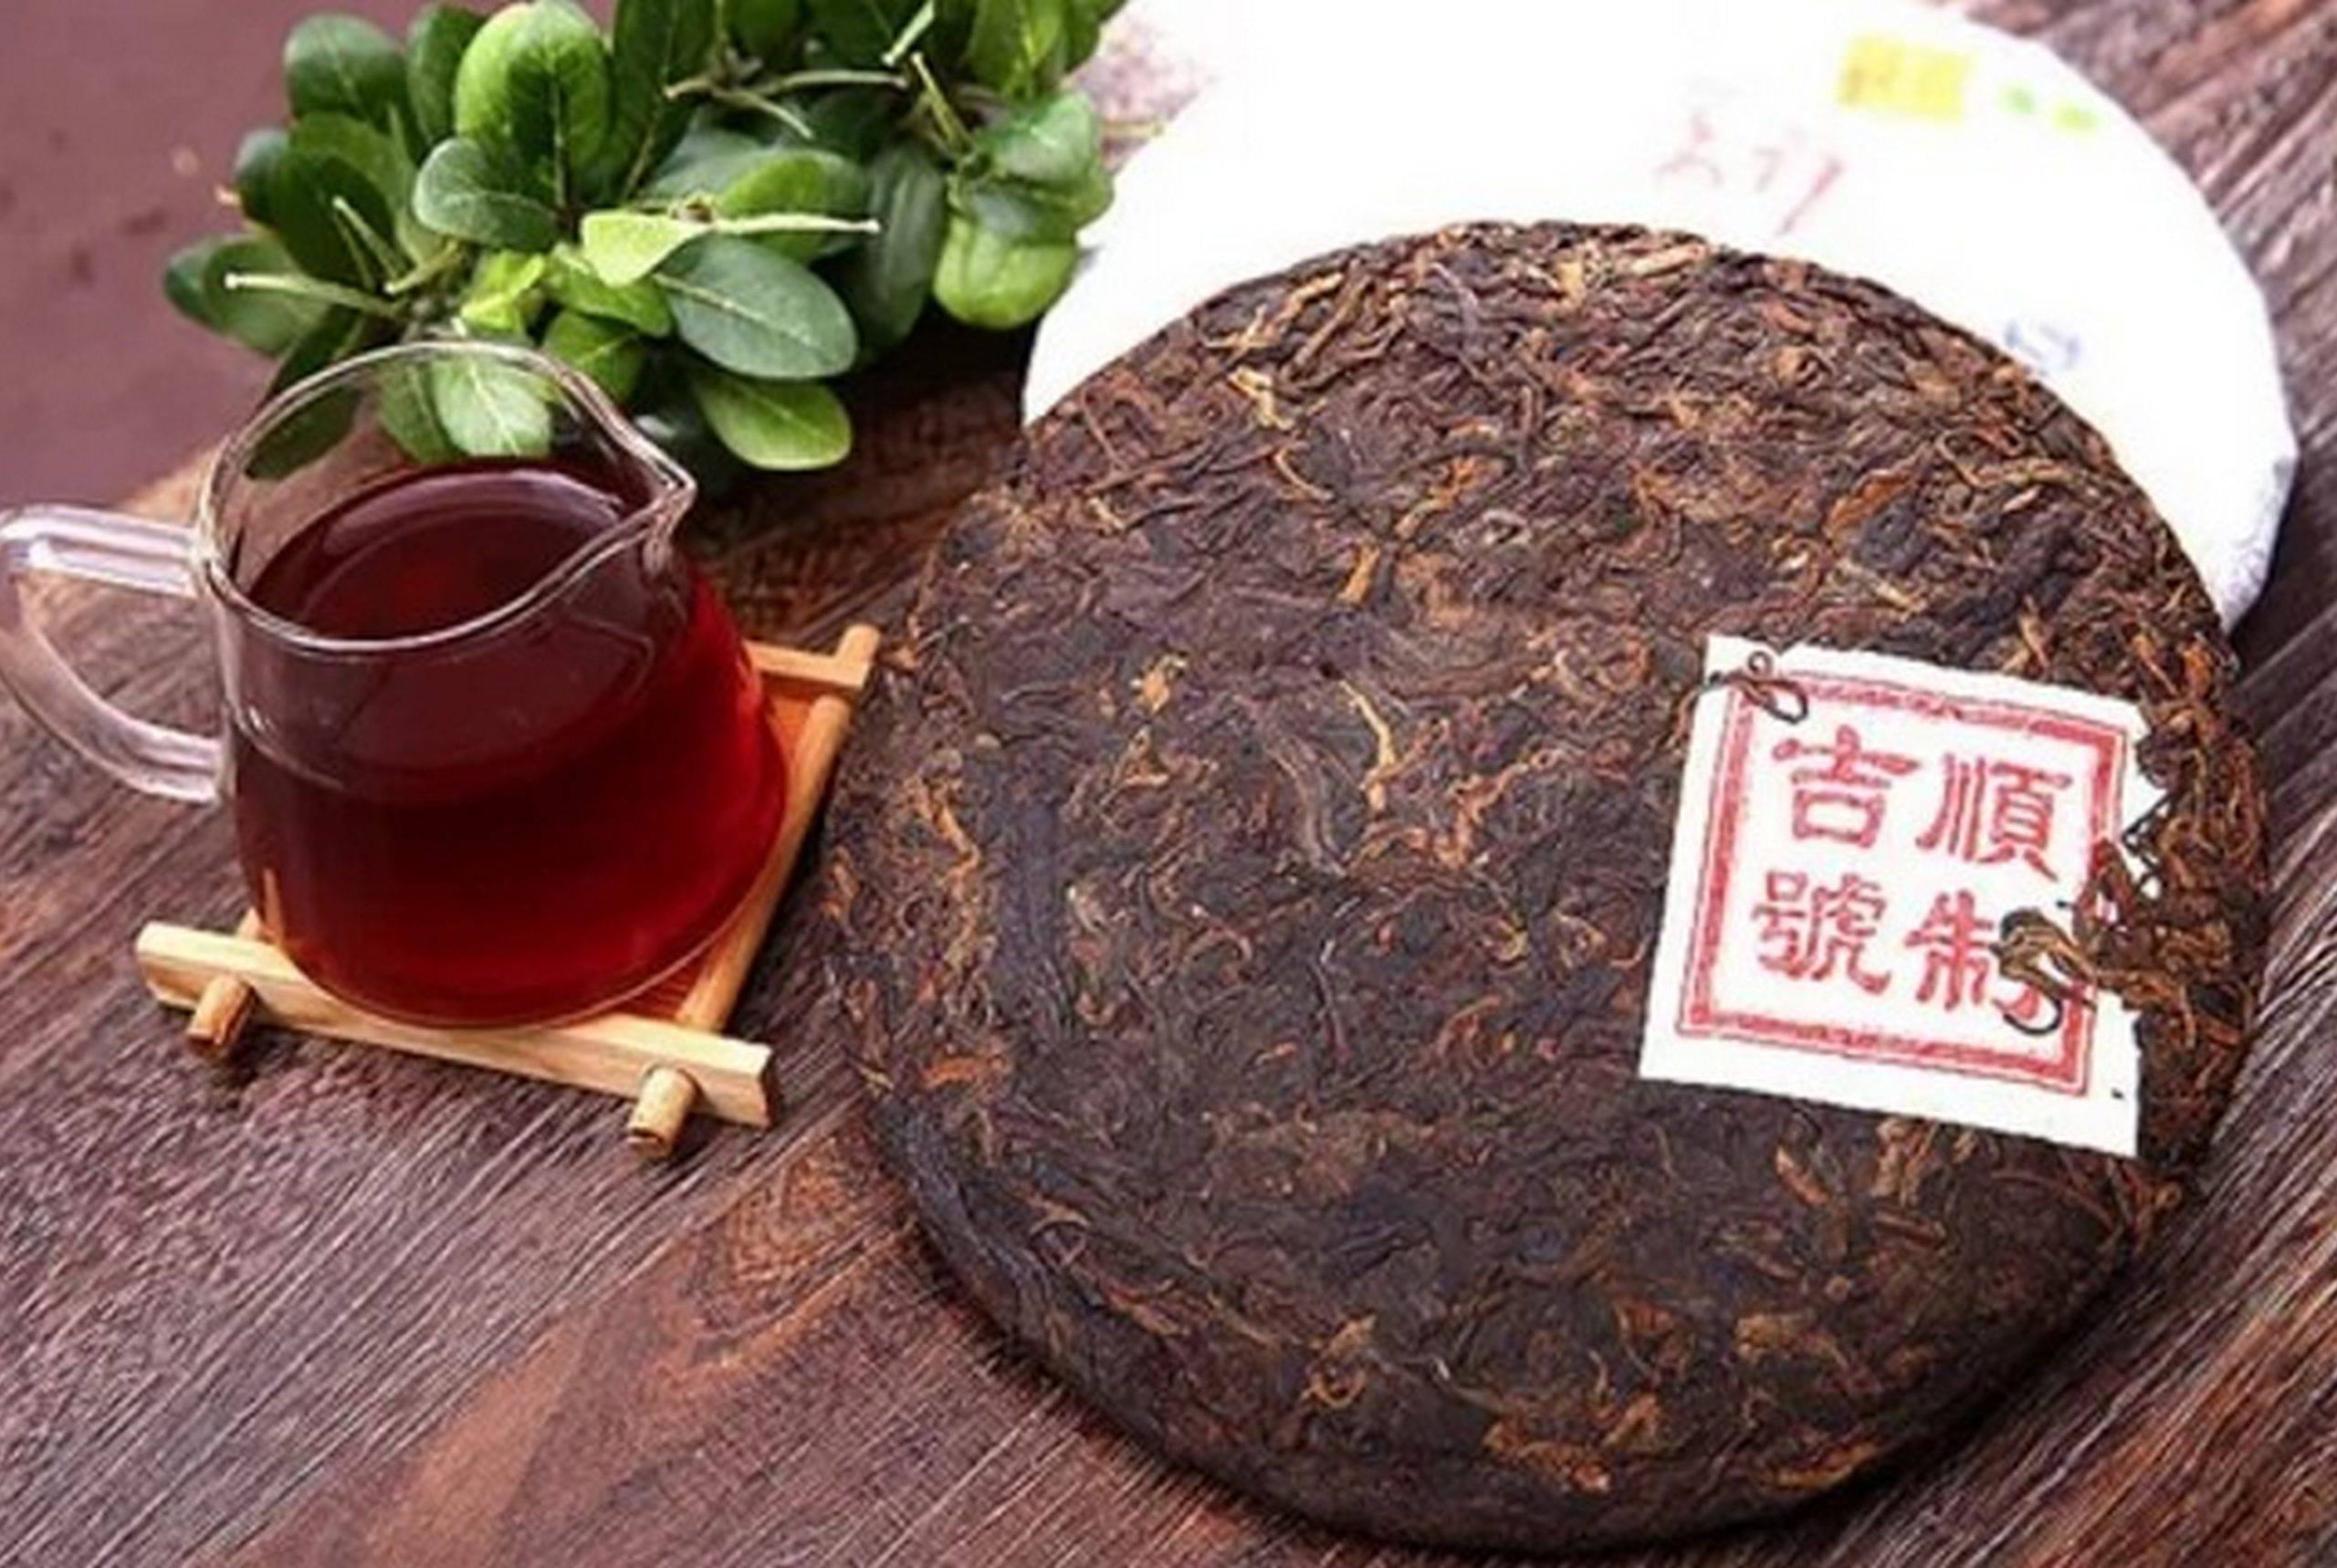 Юньнань пуэр – чай из провинции китая